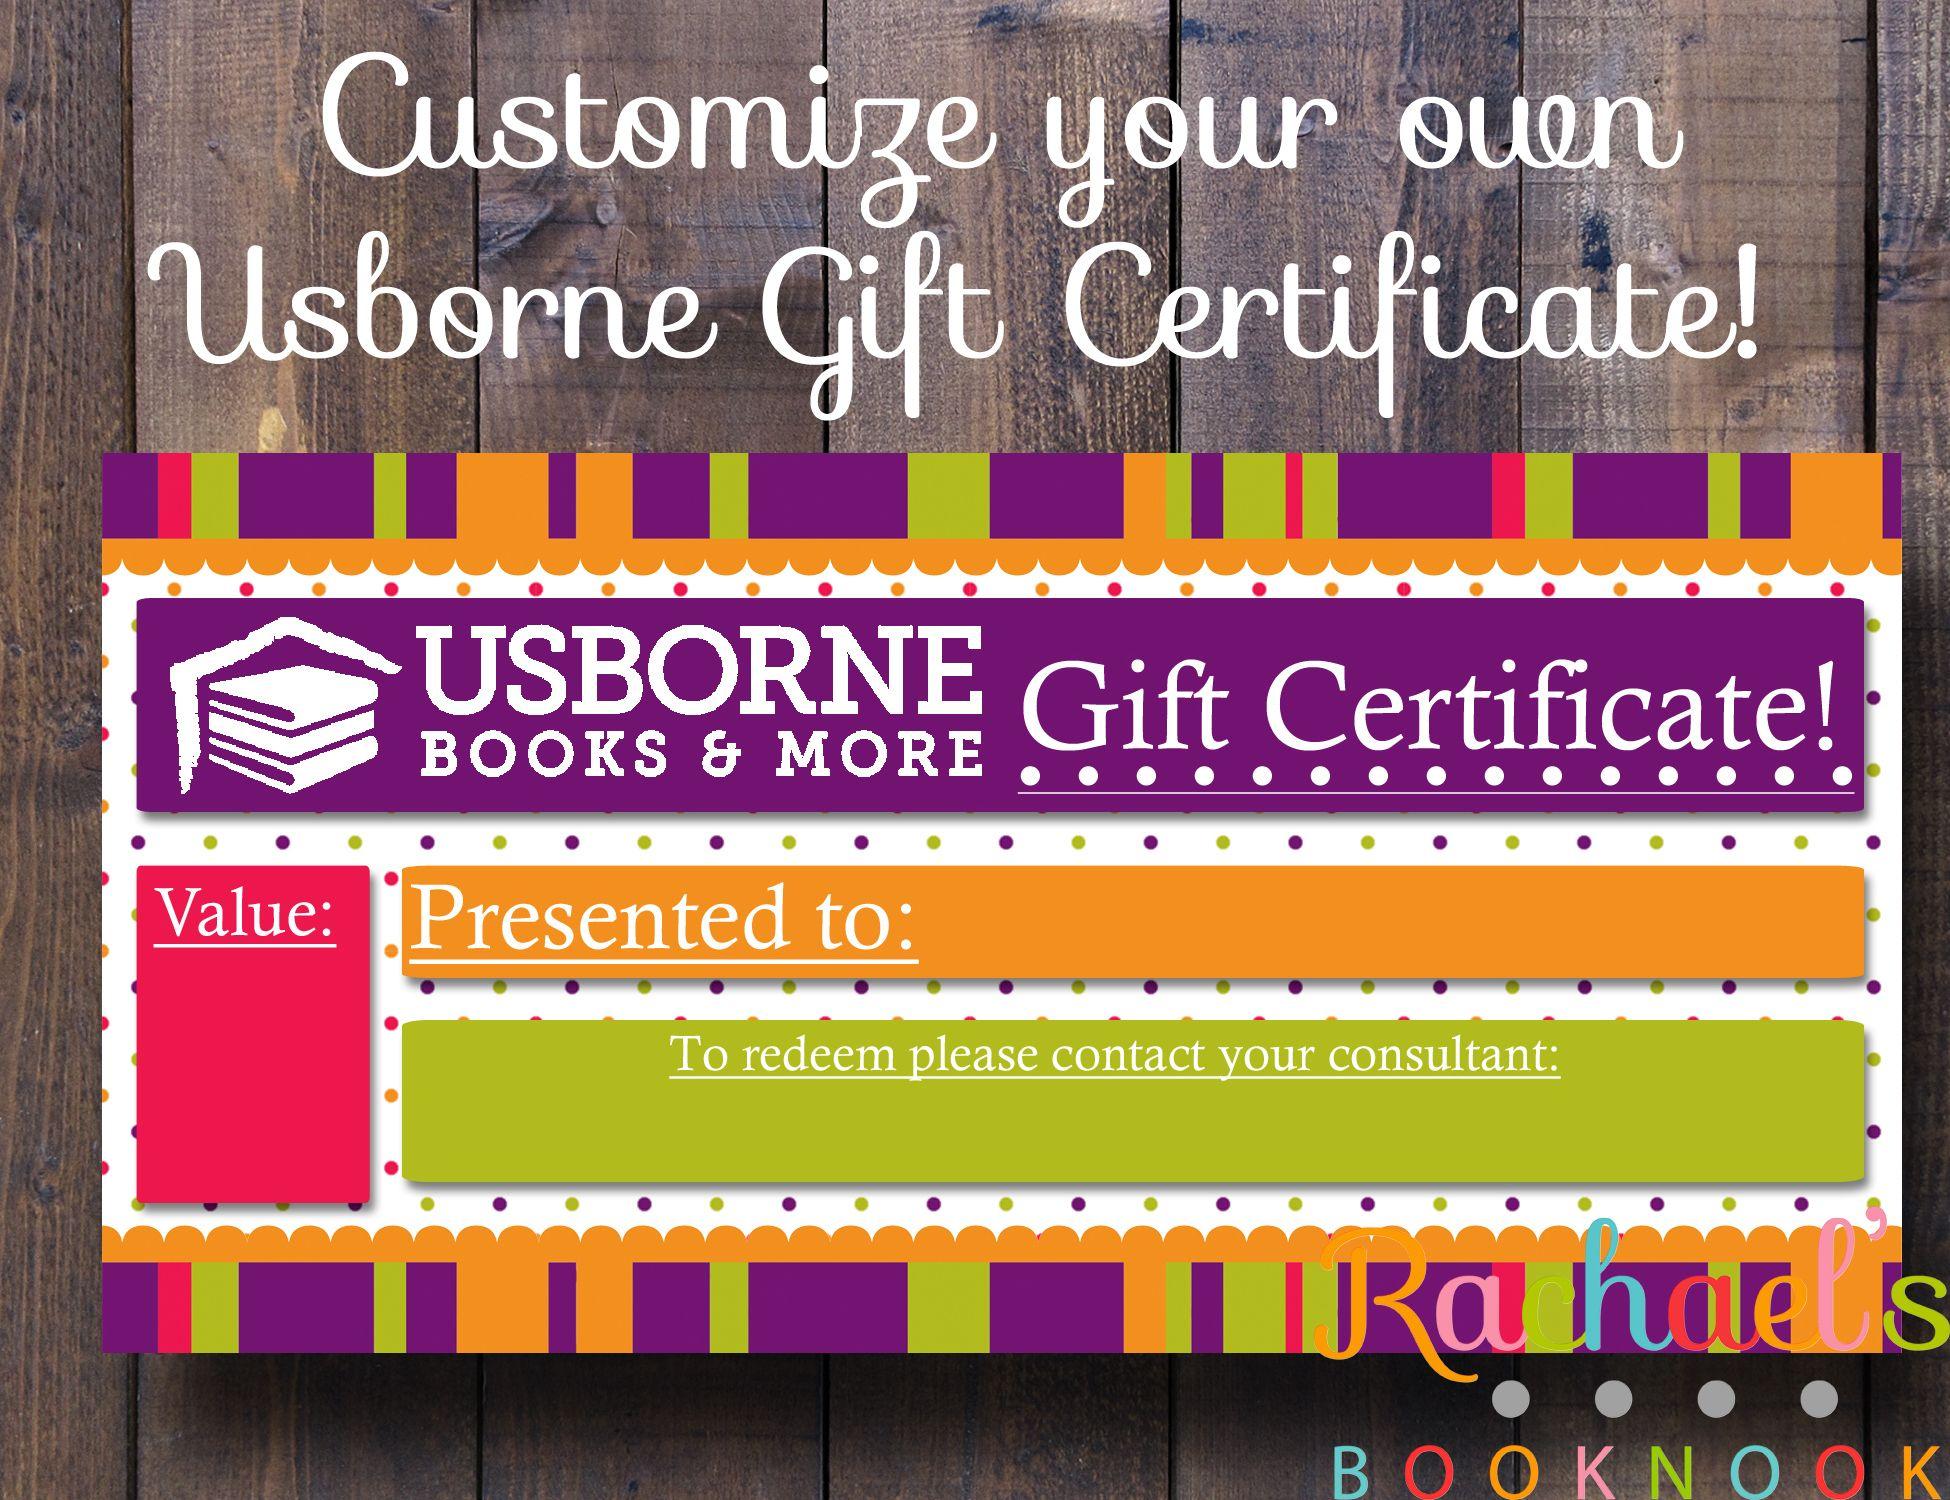 General Usborne Gift Certificate | Gift certificates, Certificate ...